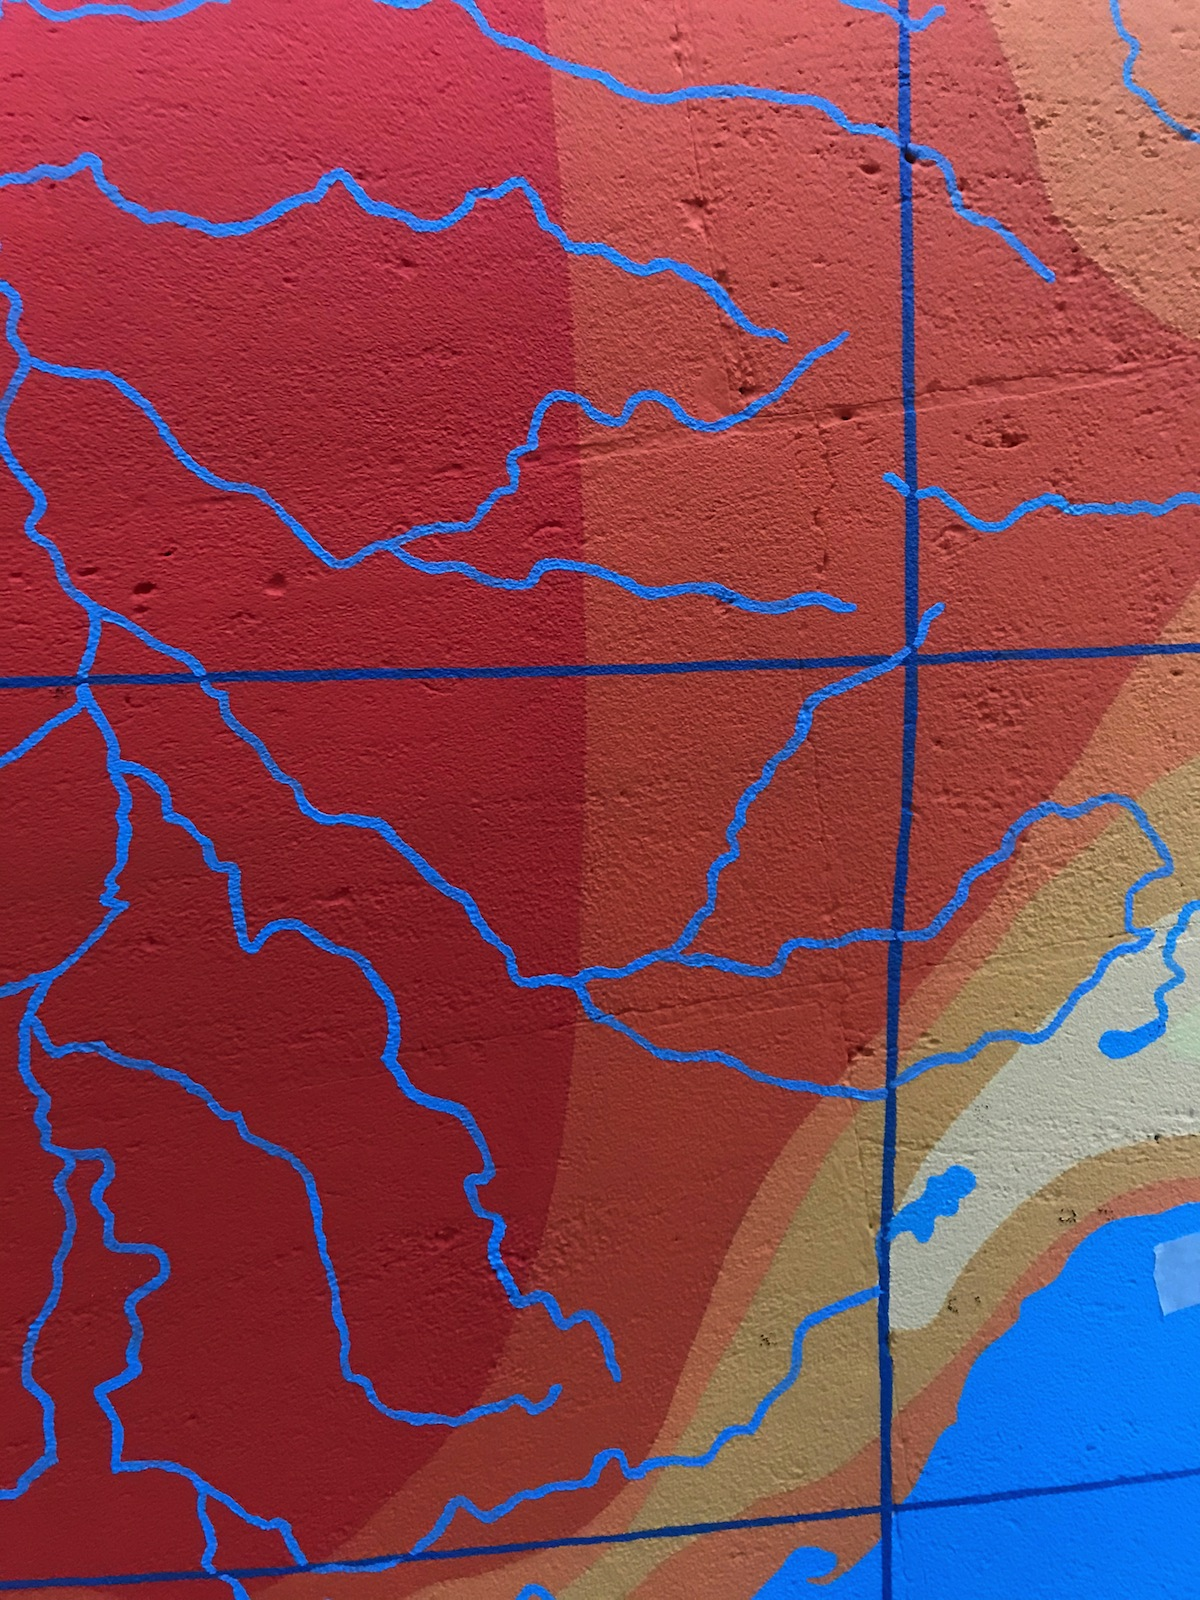 Buckminster_fuller_mural_dymaxion_map-09